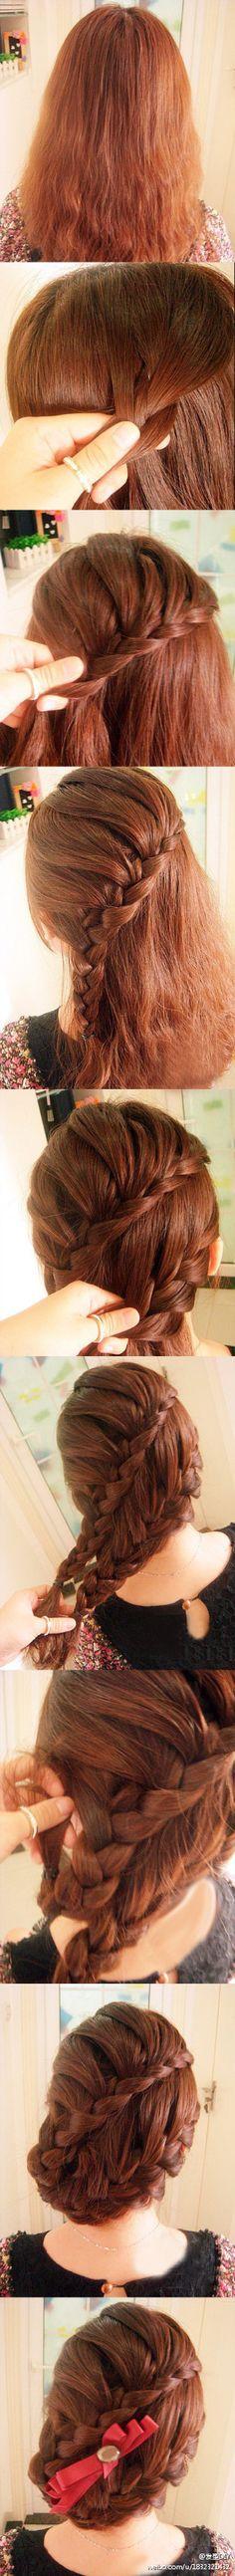 teaching you how to braid